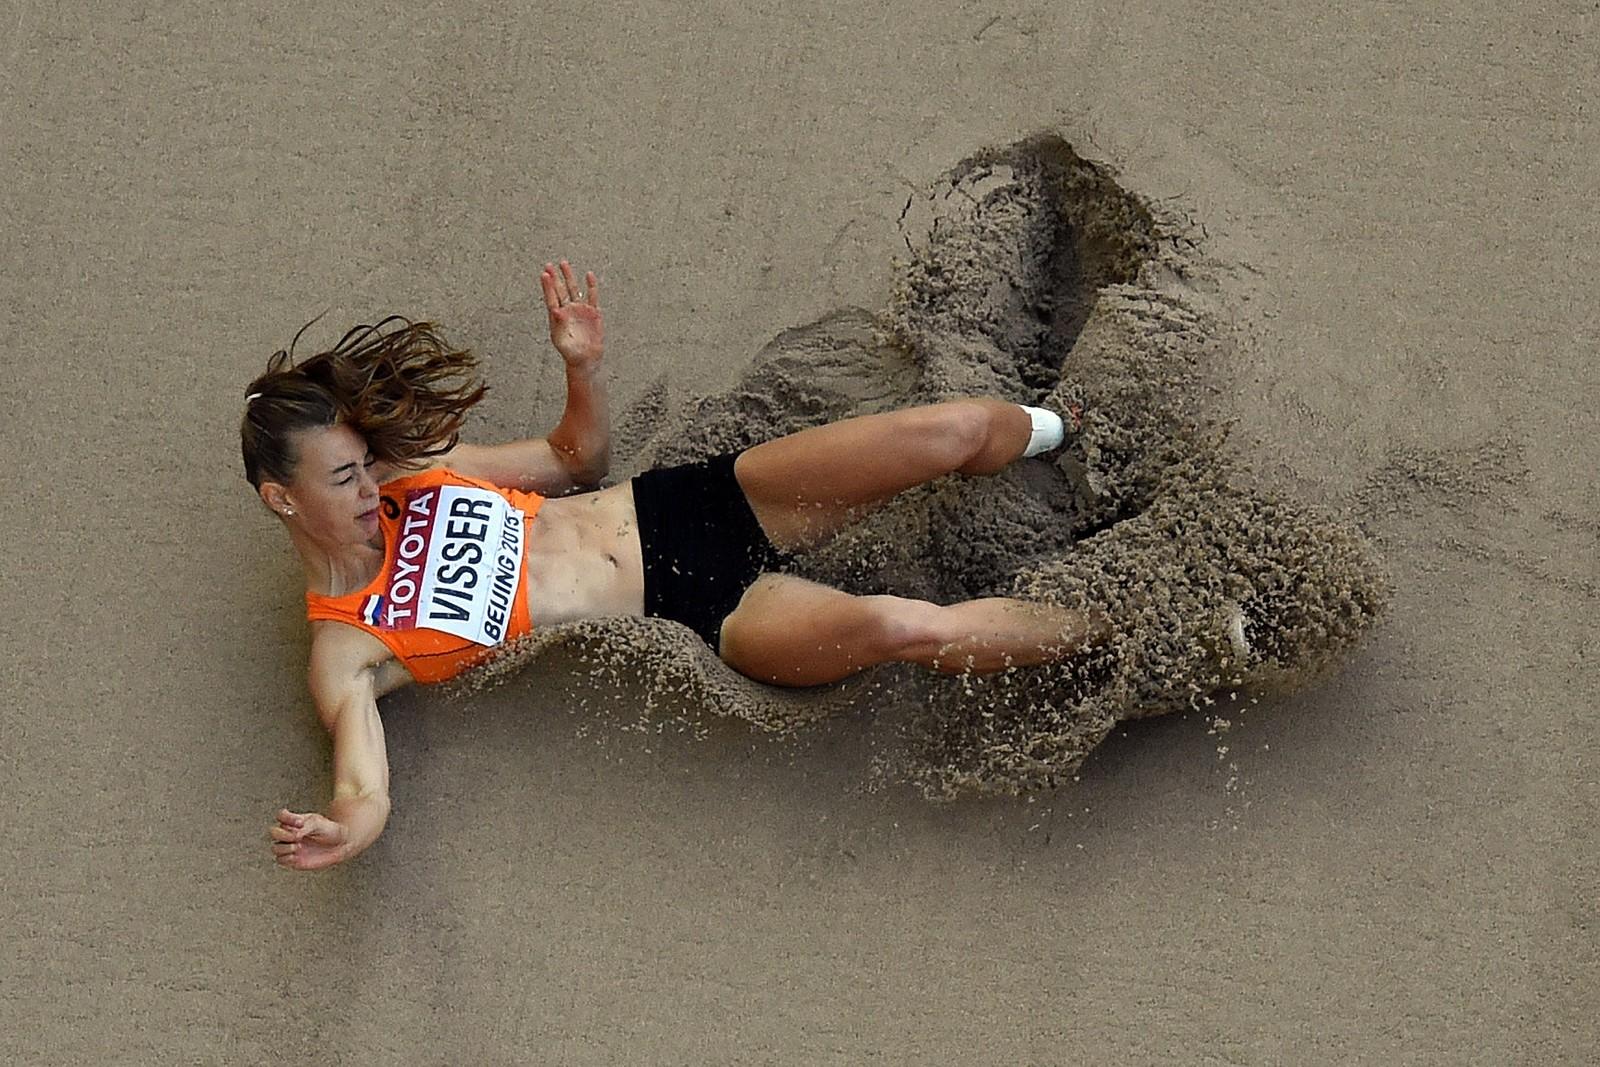 Nederlandske Nadine Vissers nedslag får sanden til å sprute under sjukampen i VM denne uka.